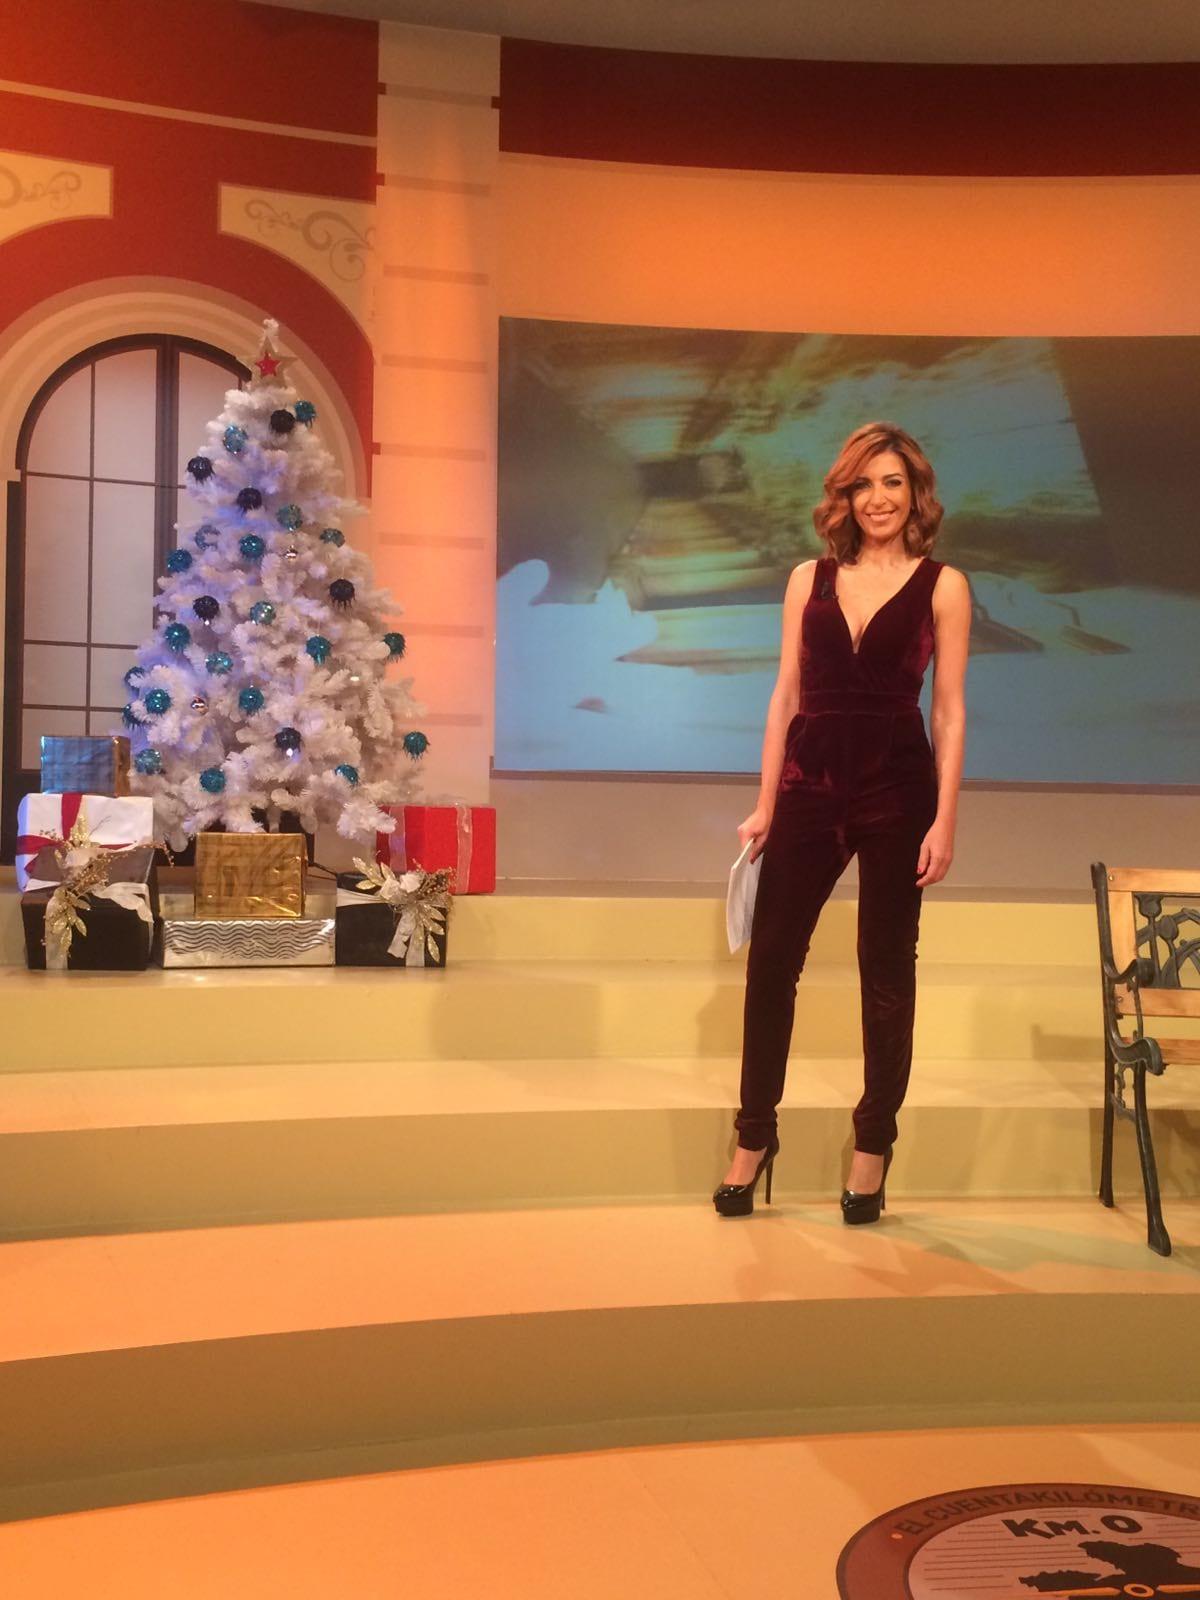 Entrevista a Mariló Leal en Zascandileando